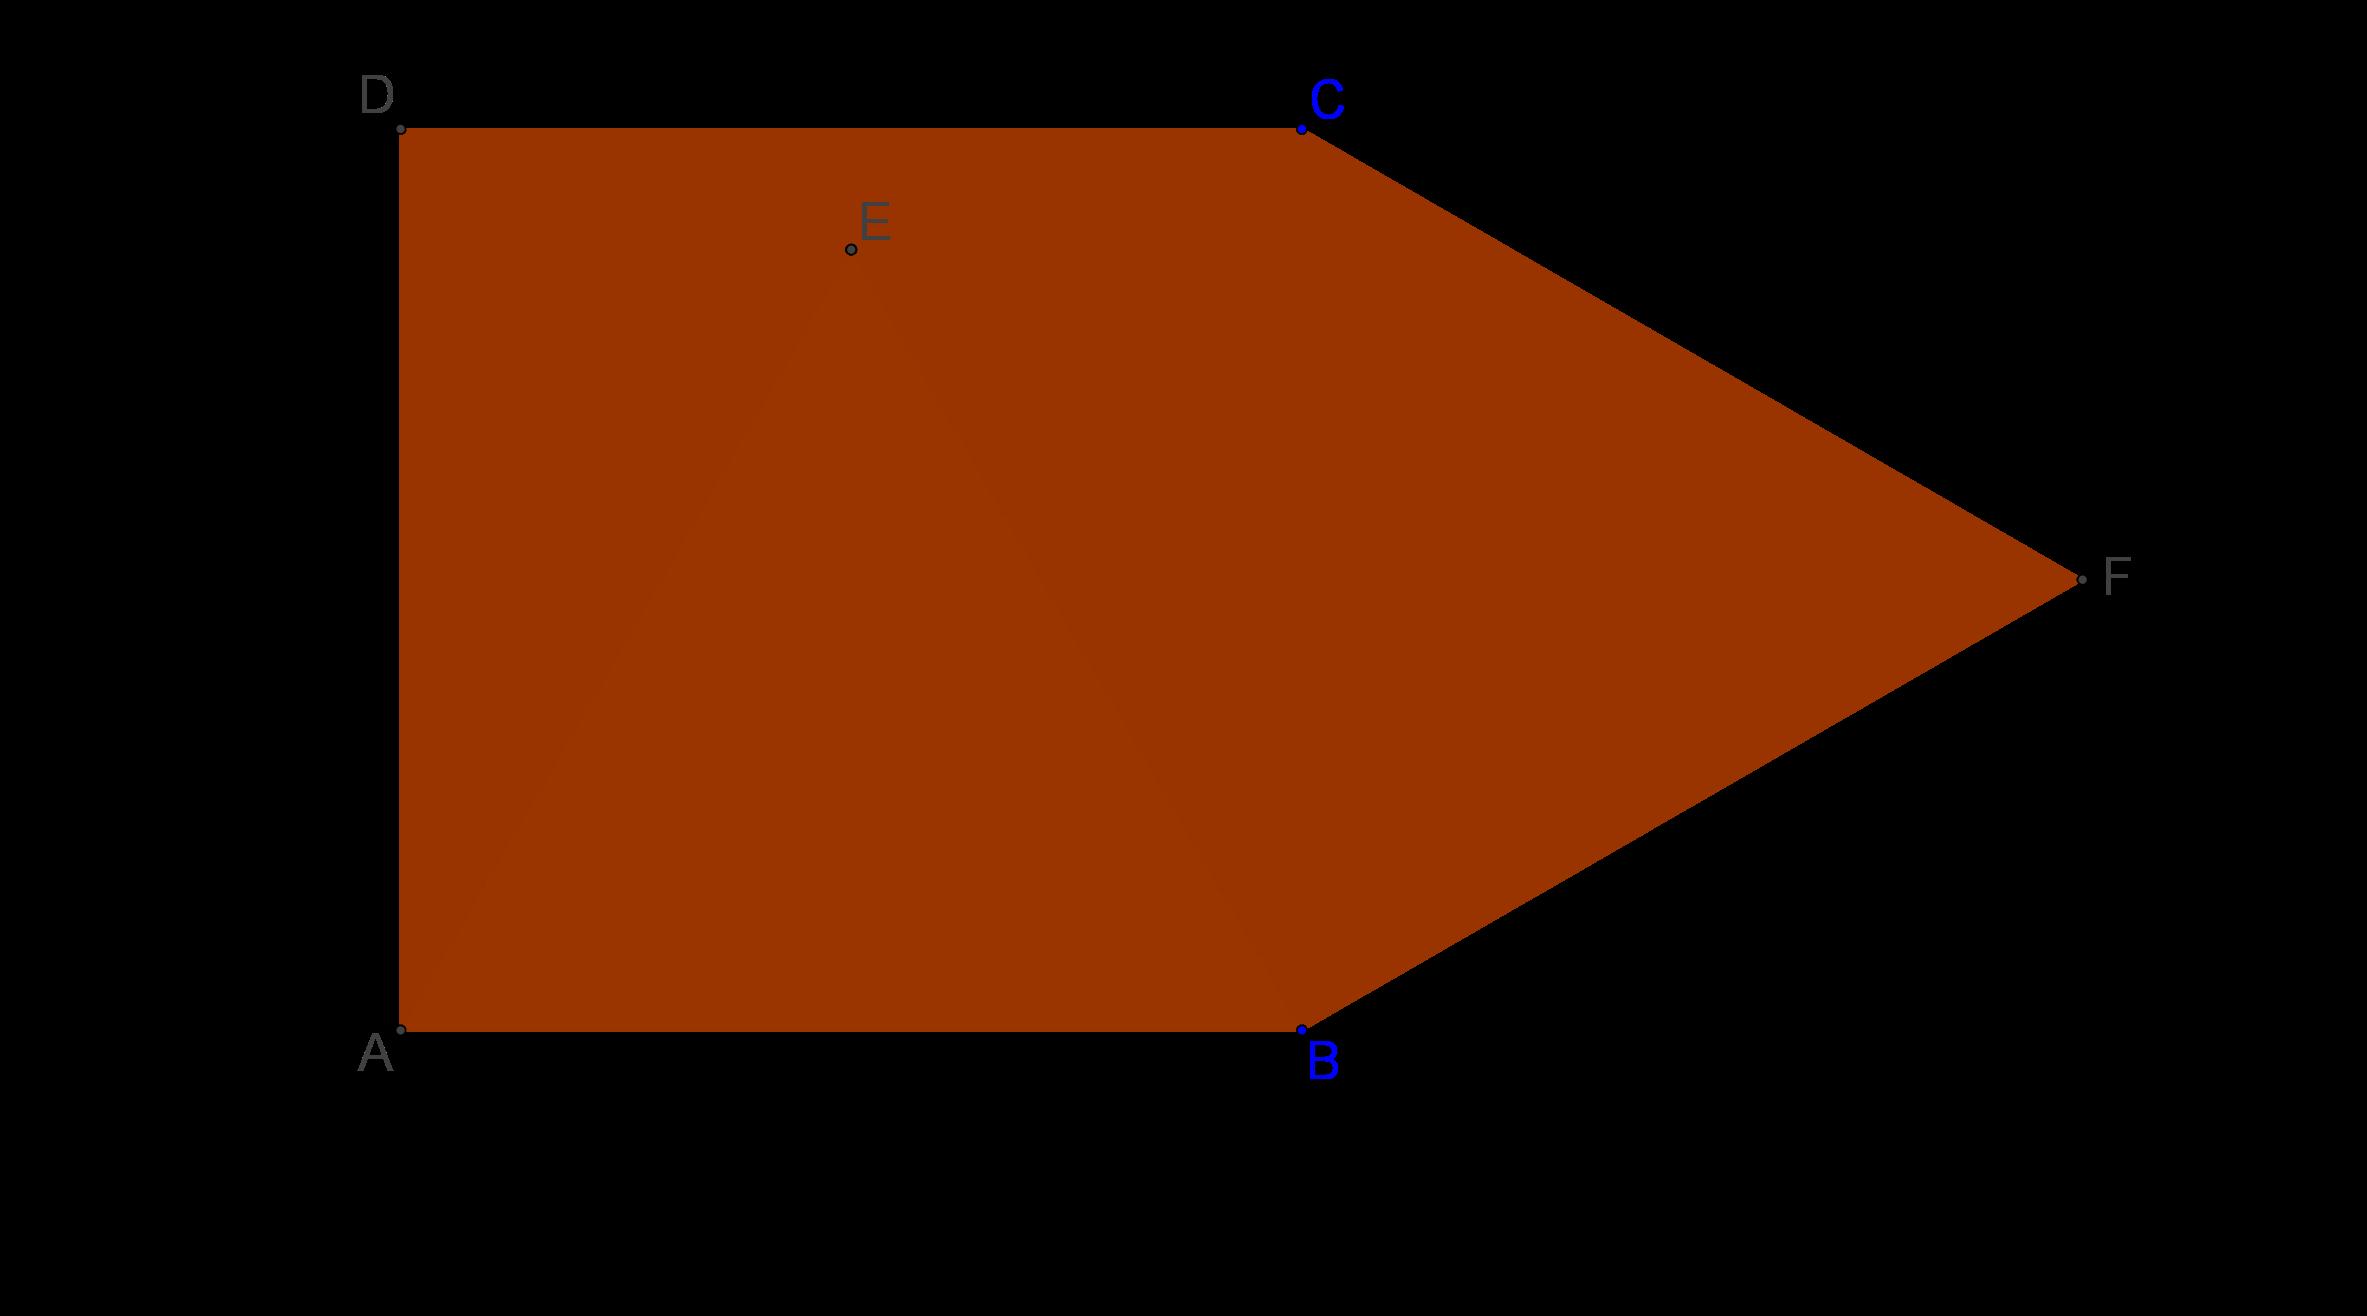 Mathplace figure-5-trigo Exercice 1 : Mesure des angles orientés